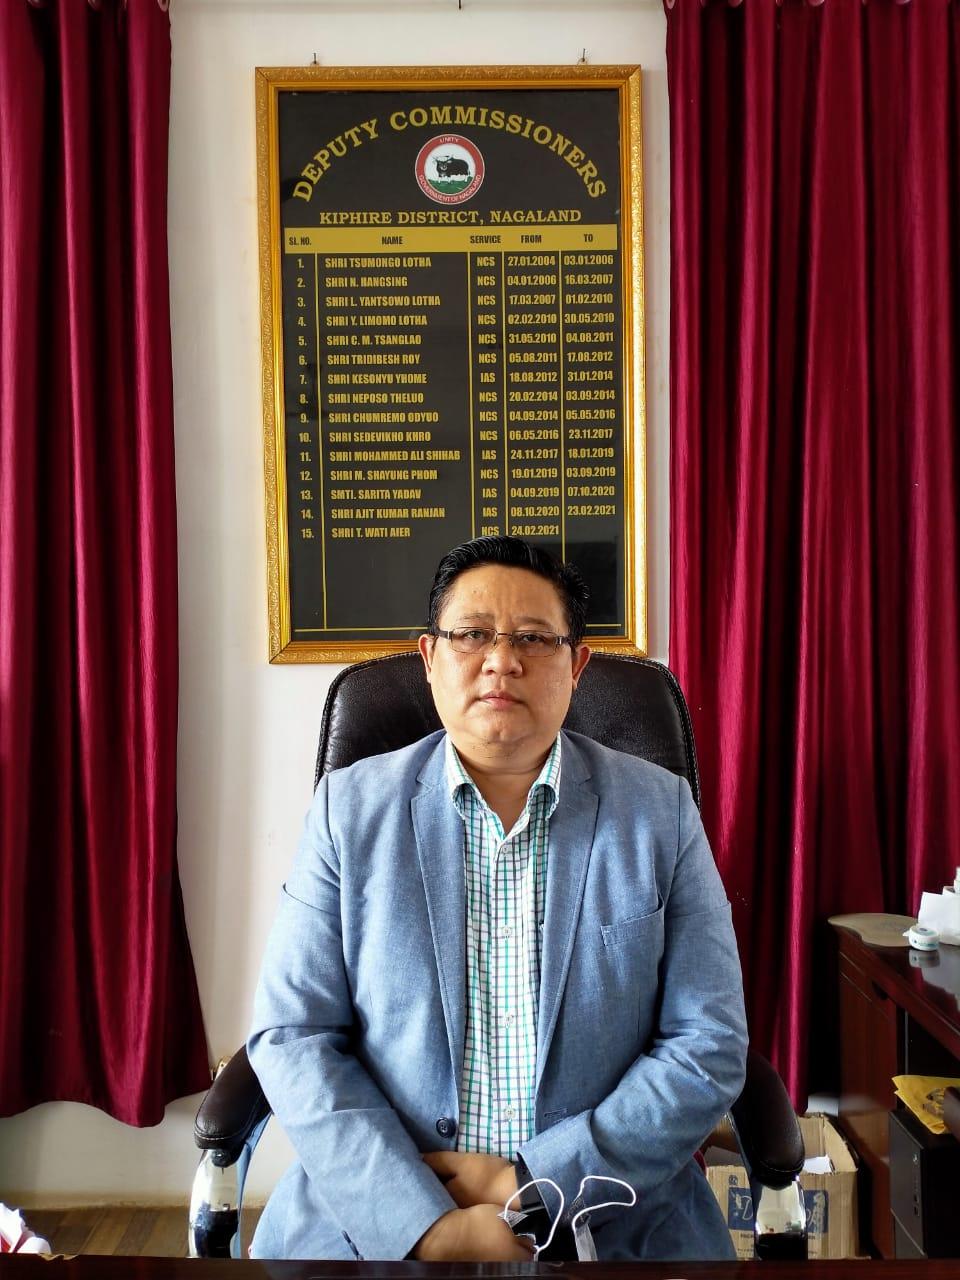 Shri. T Wati Aier, NCS